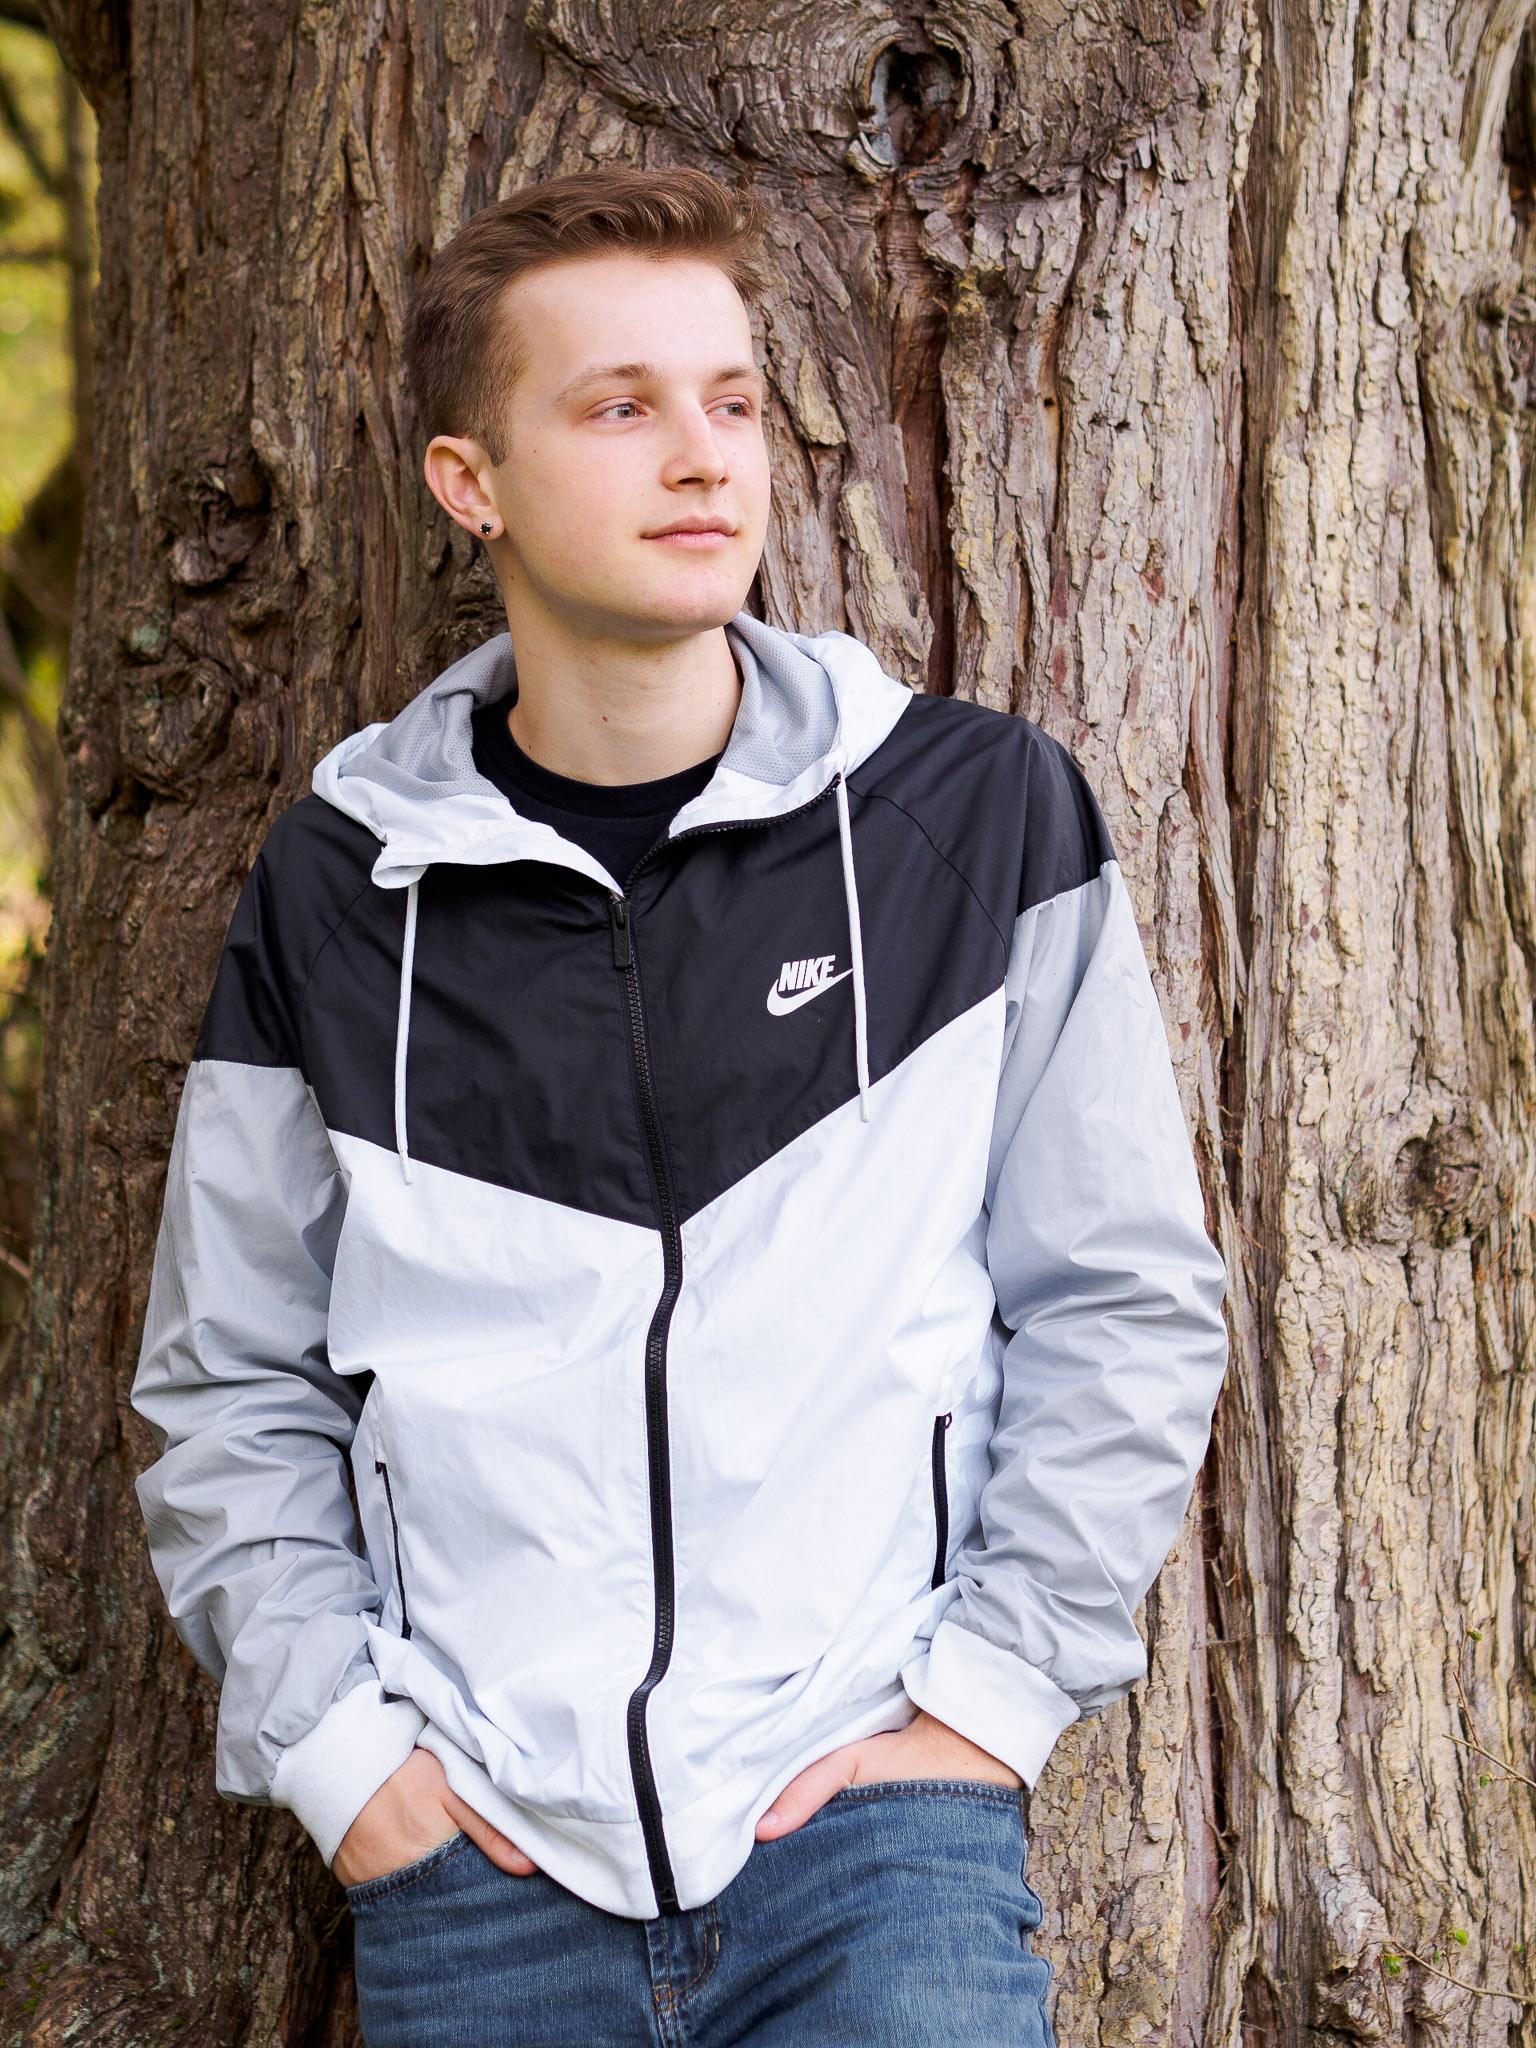 High School Senior Photographer Orange County CA-7.jpg